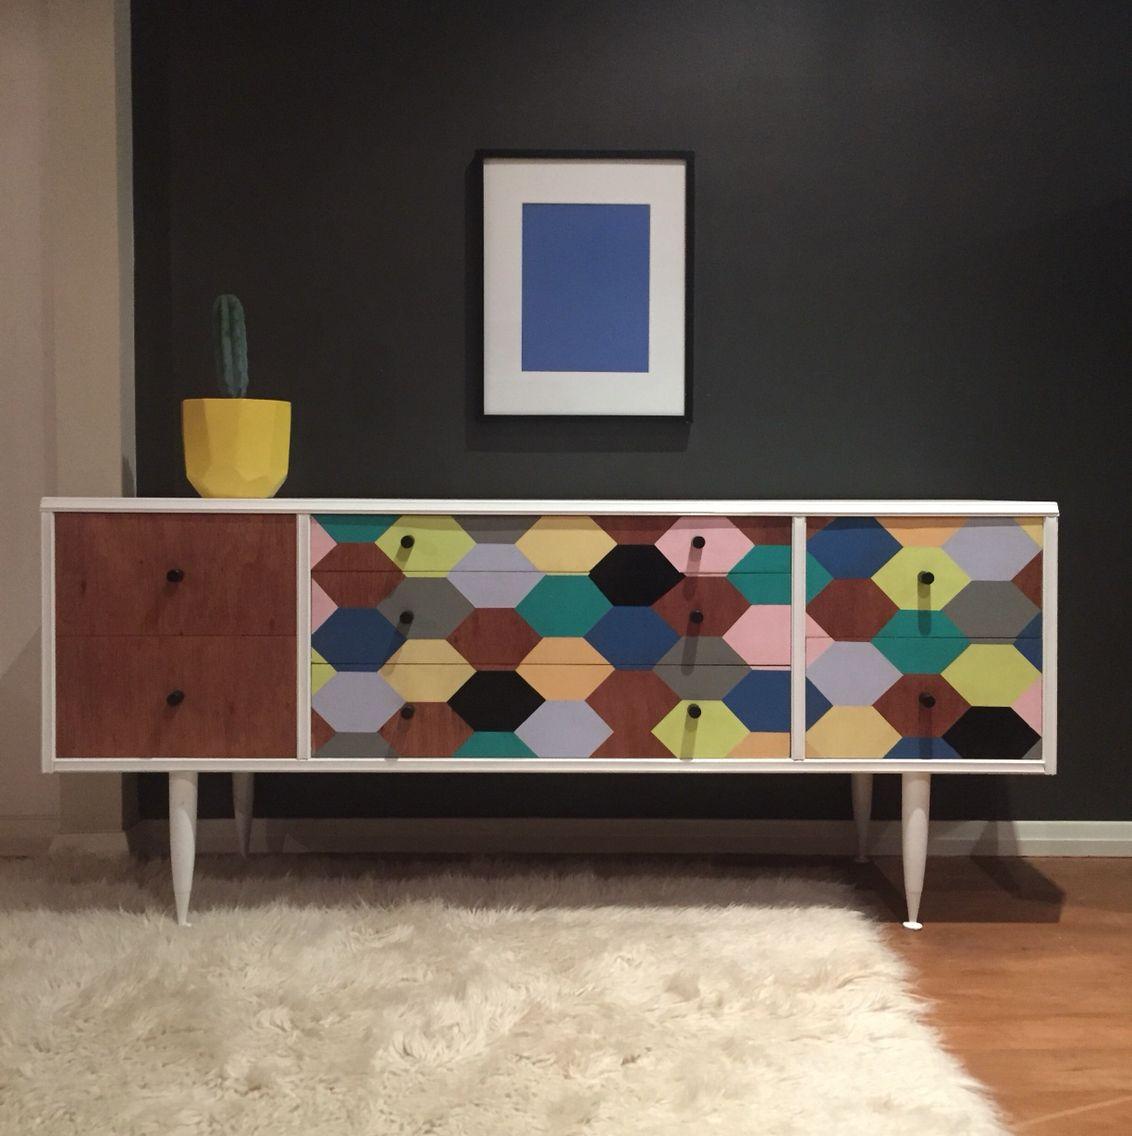 2e93f77137799795dfc2e863d17141b9 Painted Geometric Modern Credenza Sideboard on modern sideboard bookshelf, modern sideboard with mirror, modern sideboard kitchen, modern sideboard bar,